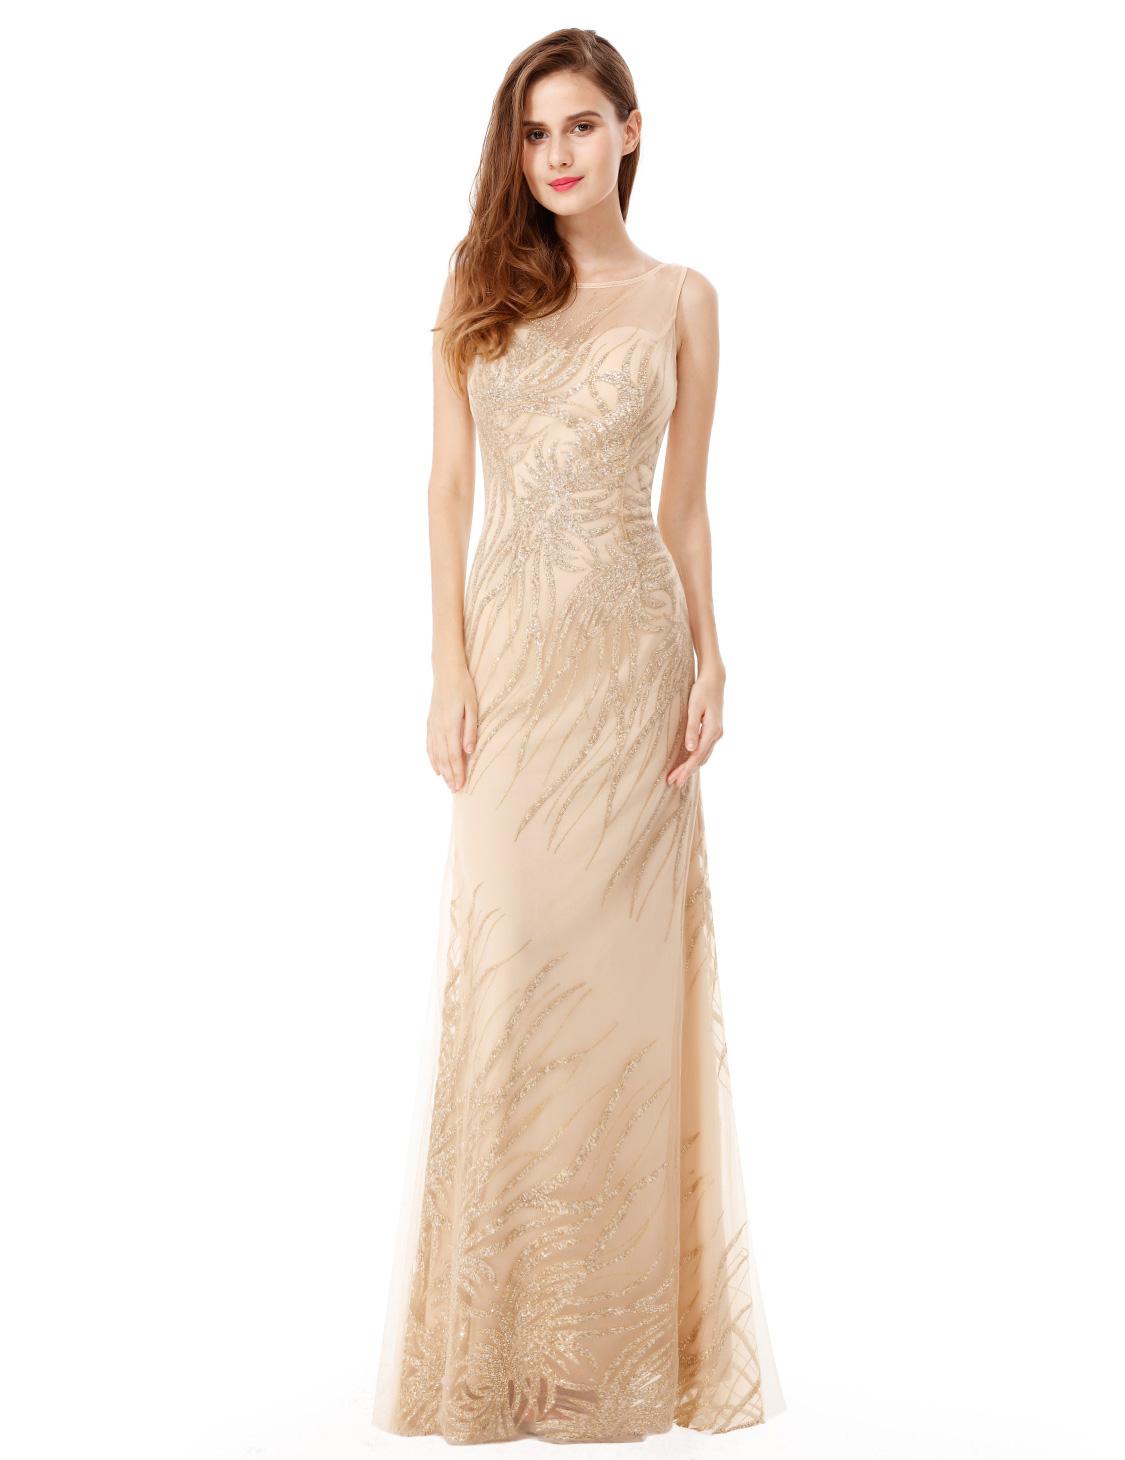 Béžové šaty na svatbu ples  2ca2d52cc6f